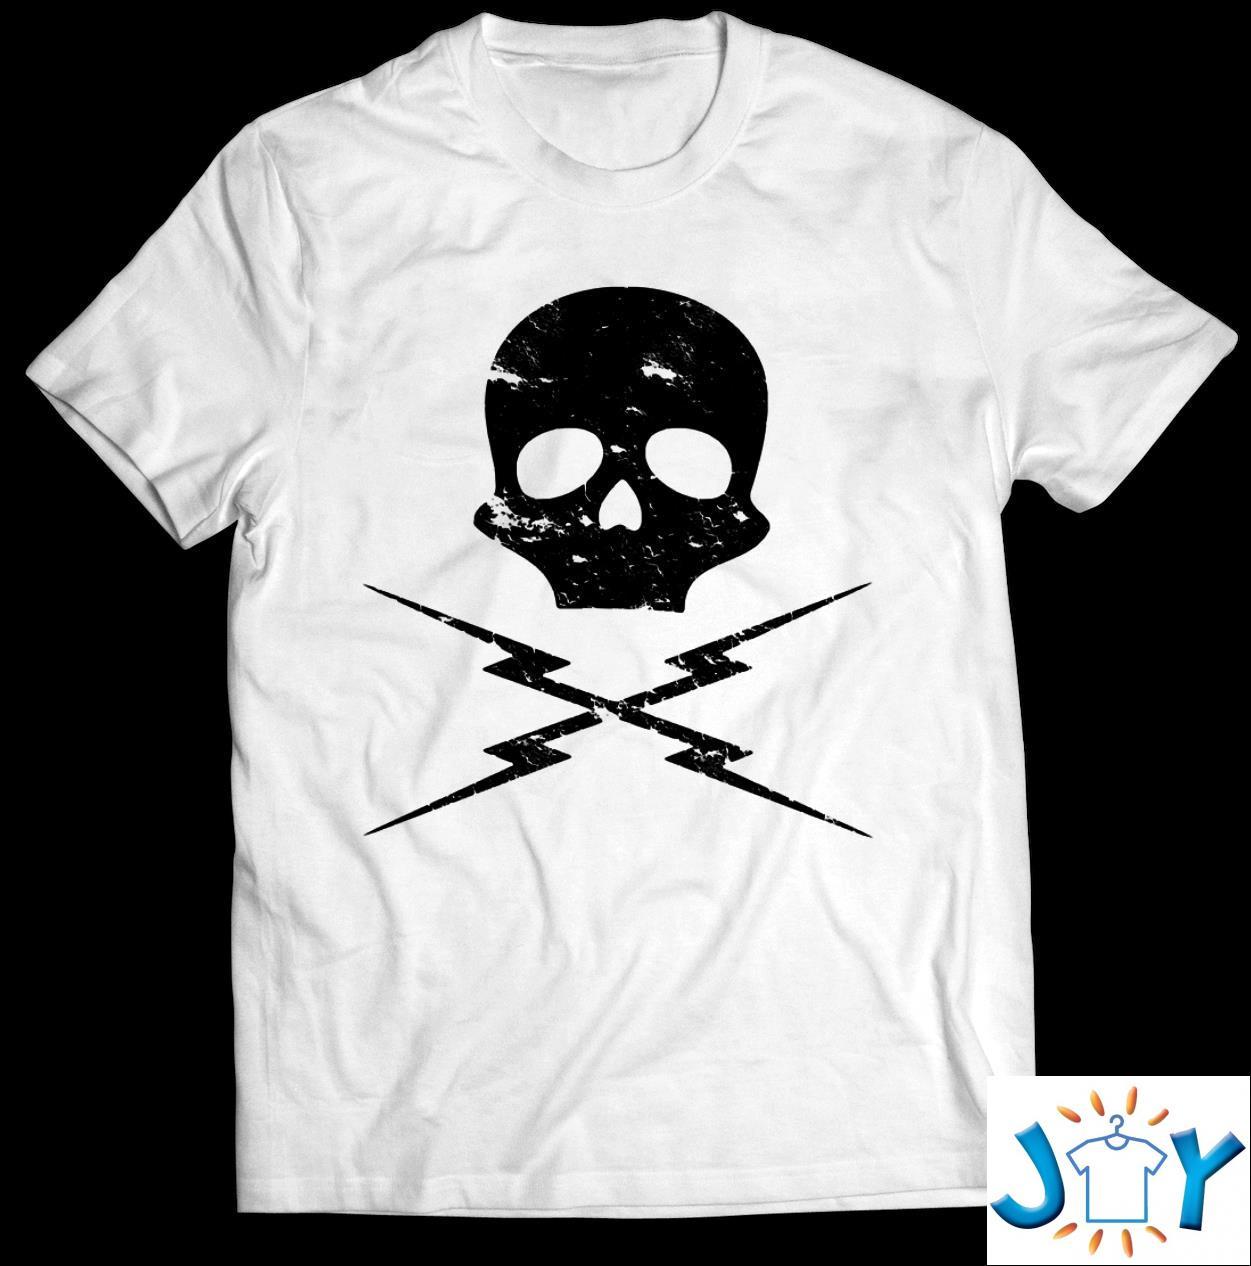 Deathproof! Essential Shirt